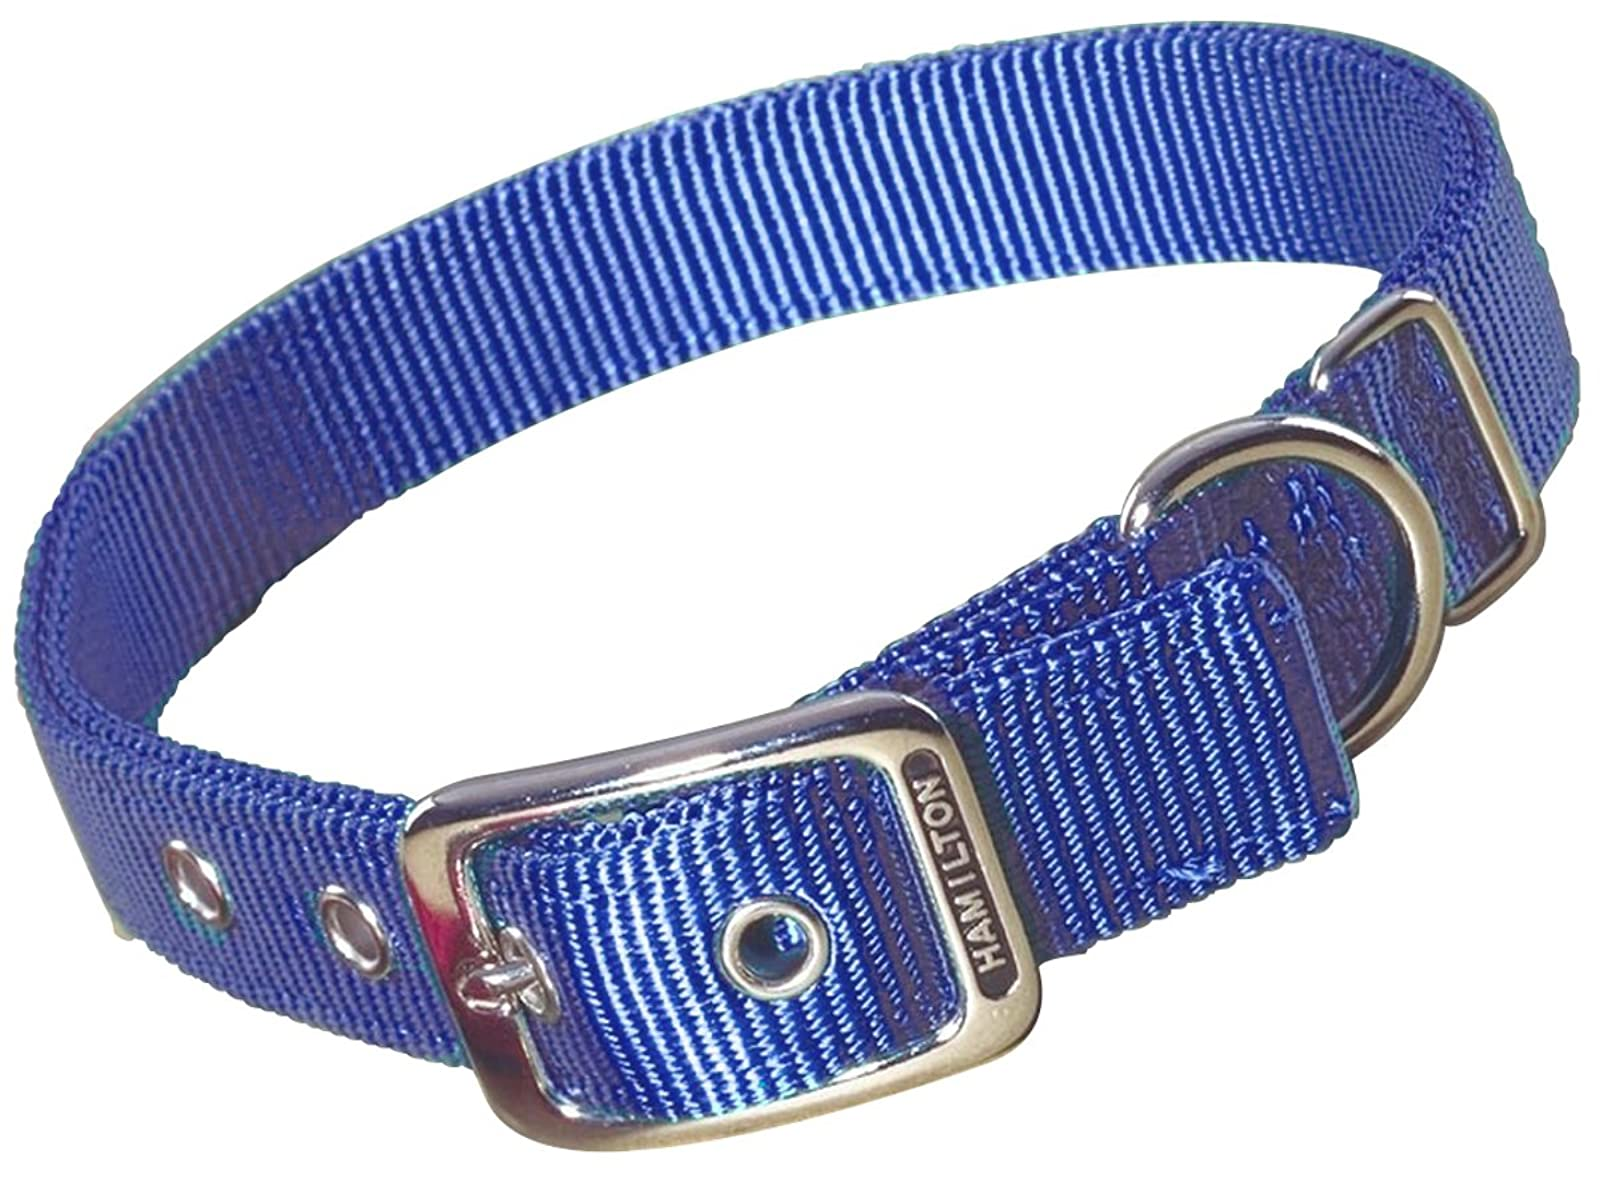 Hamilton Double Thick Nylon Deluxe Dog Collar DD 22BY - 1